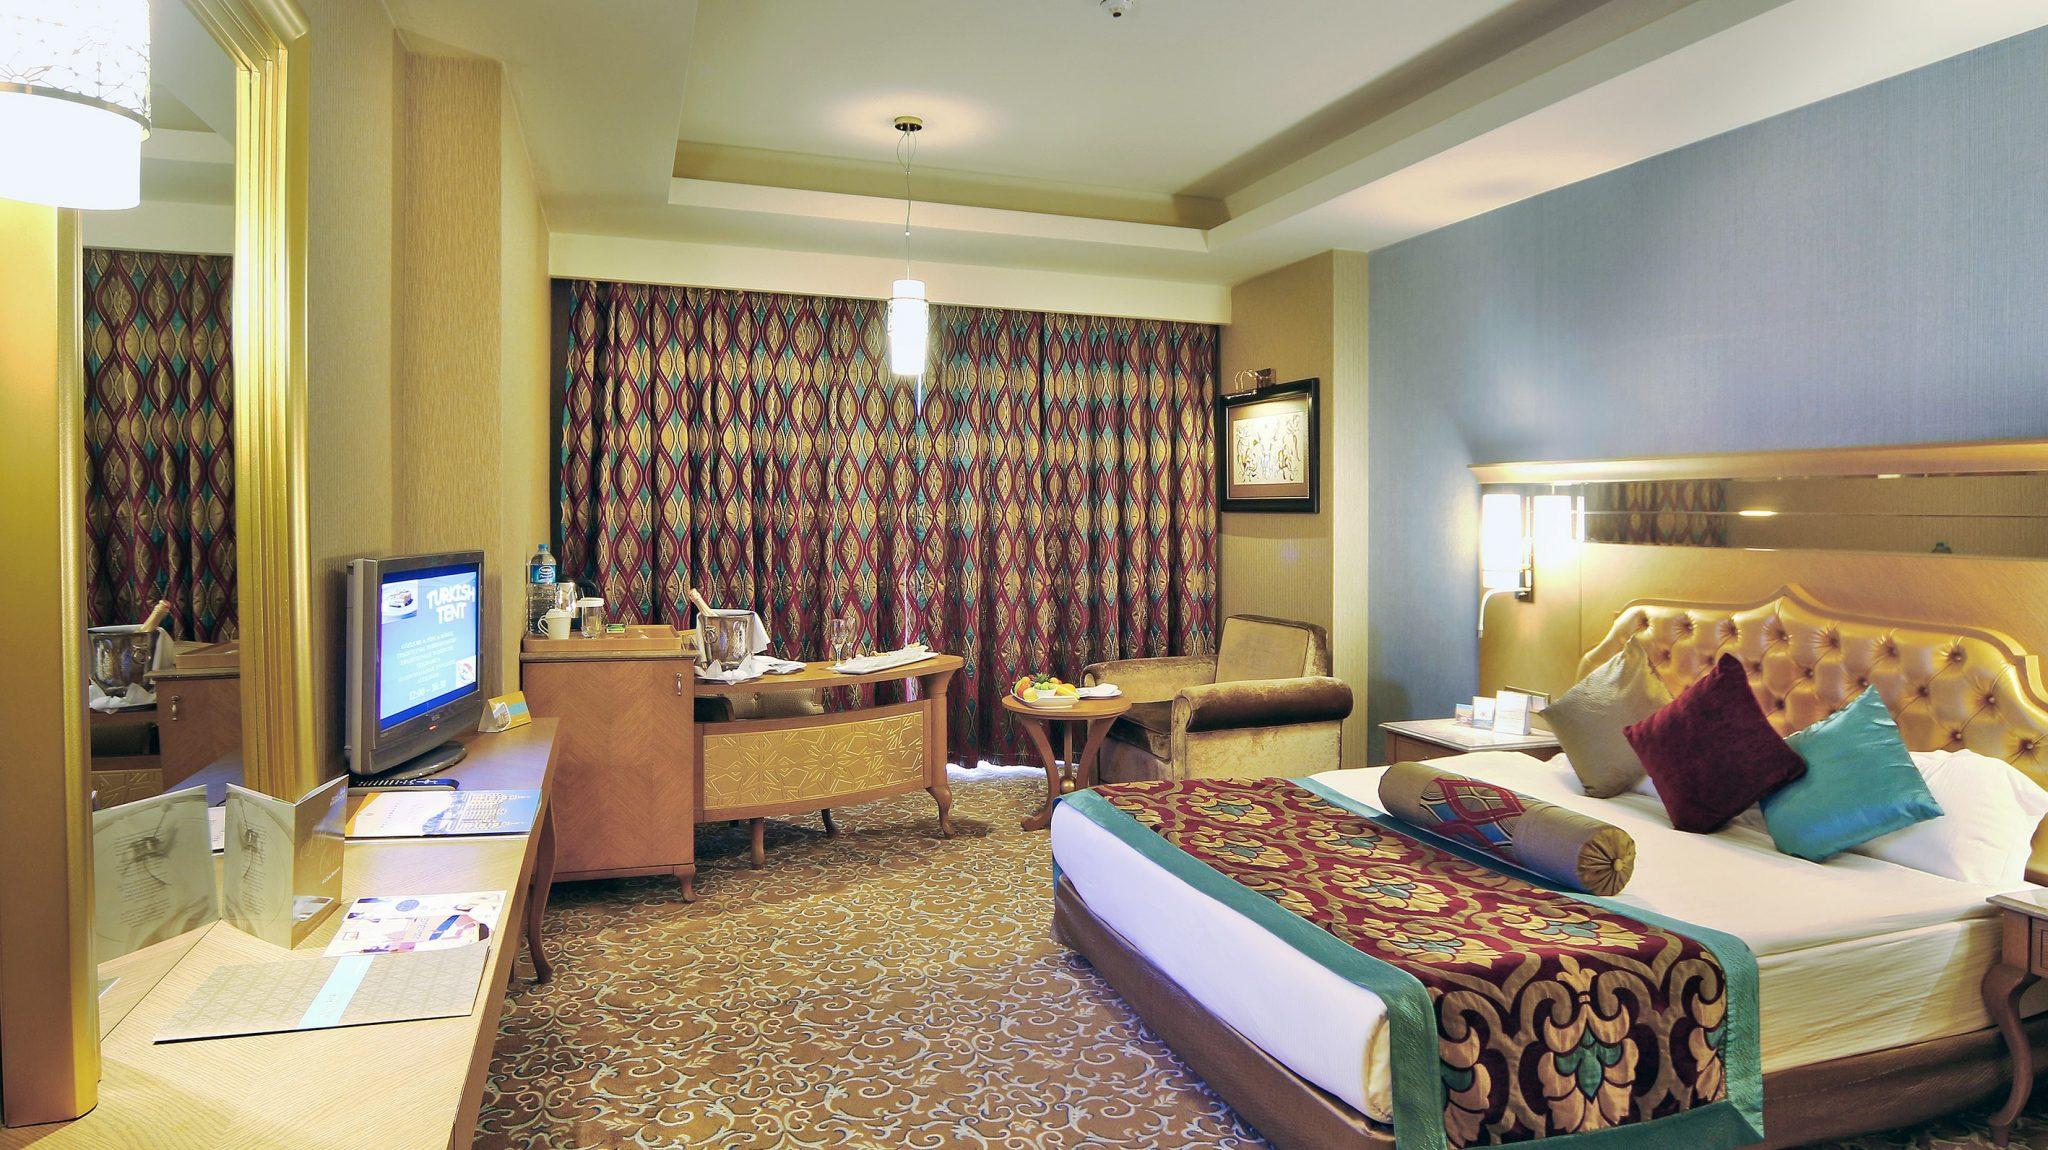 Letovanje_Turska_Hoteli_Avio_Antalija_Hotel_Royal_Holiday_Palace-17-scaled.jpg